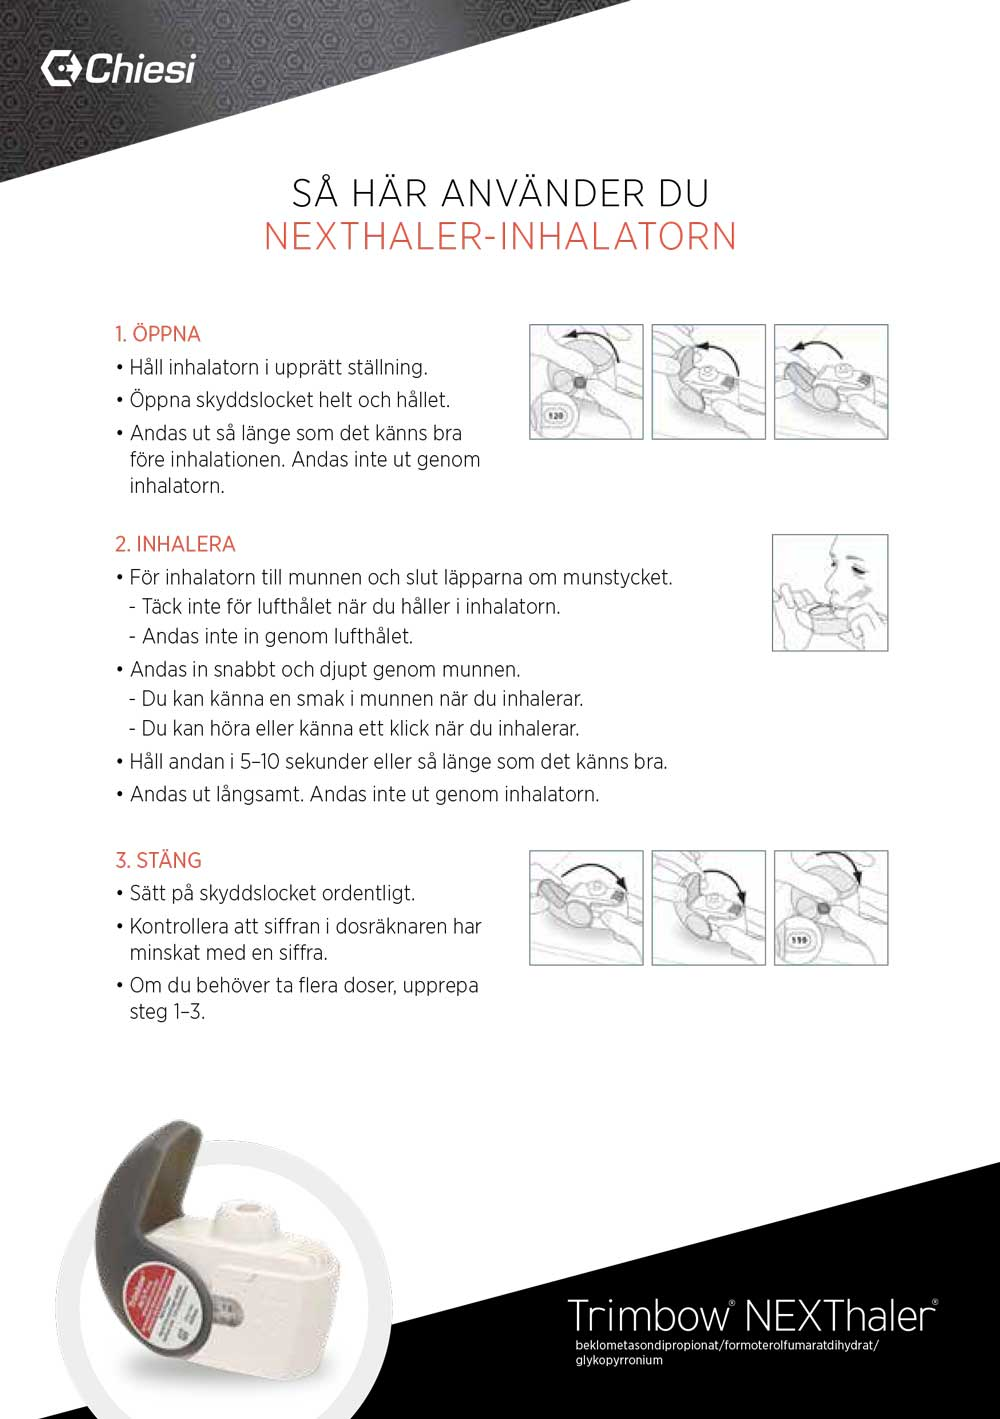 nexthaler-inhalatorn.jpg